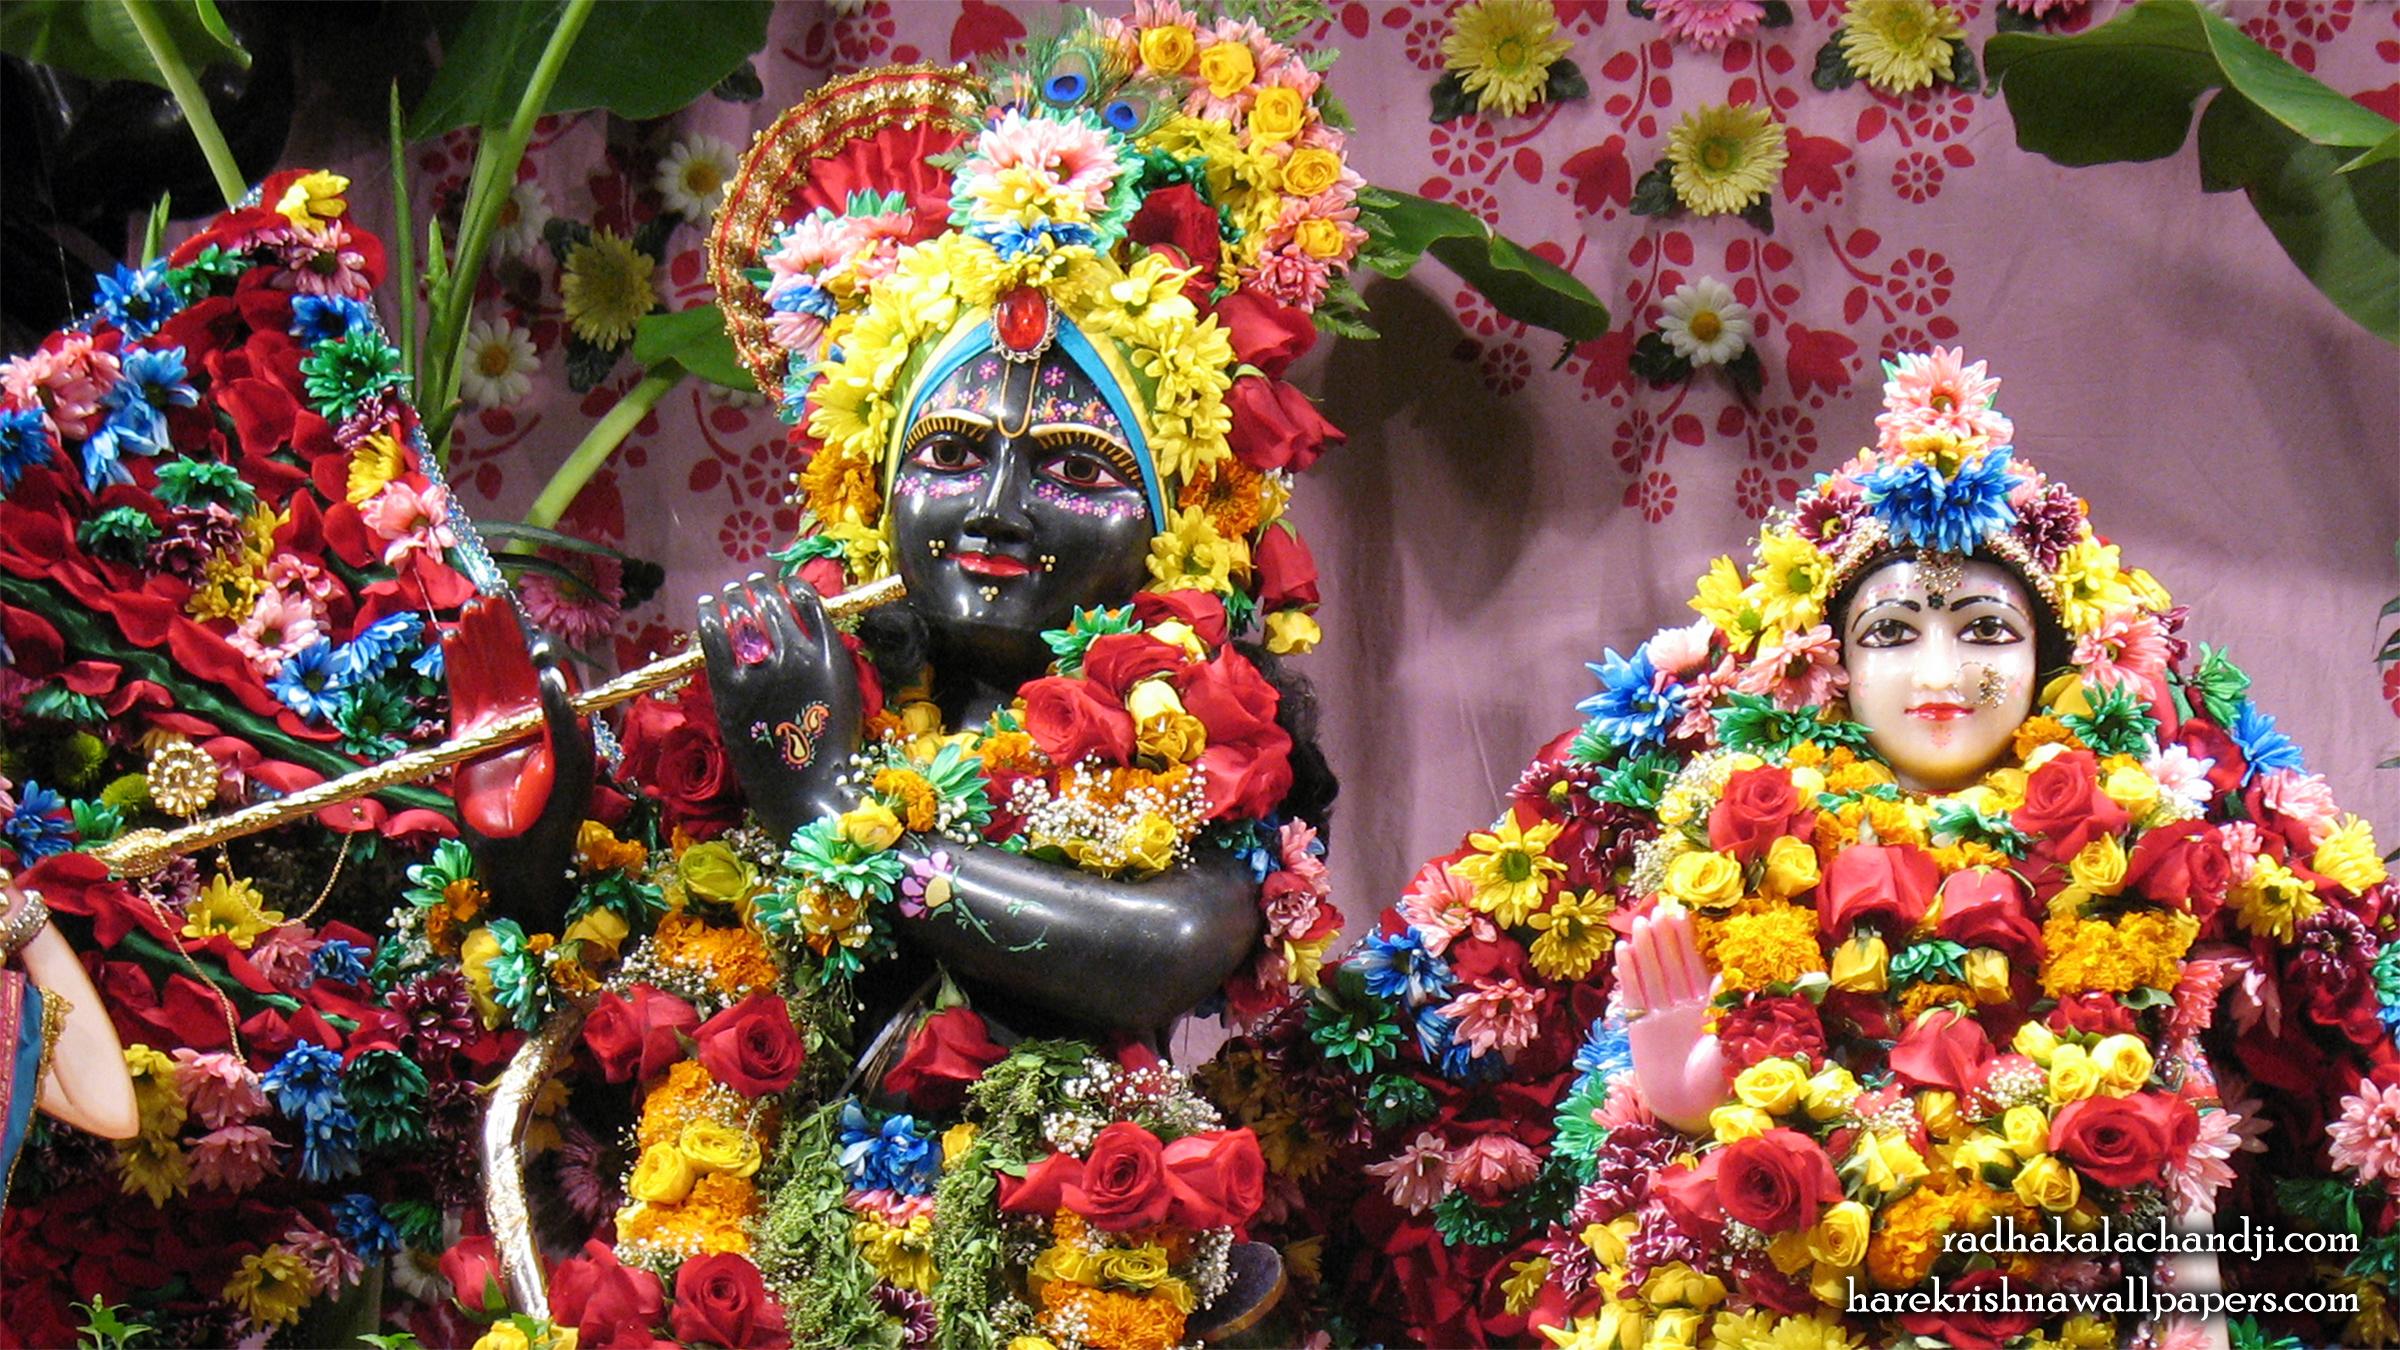 Sri Sri Radha Kalachanda Close up Wallpaper (001) Size 2400x1350 Download